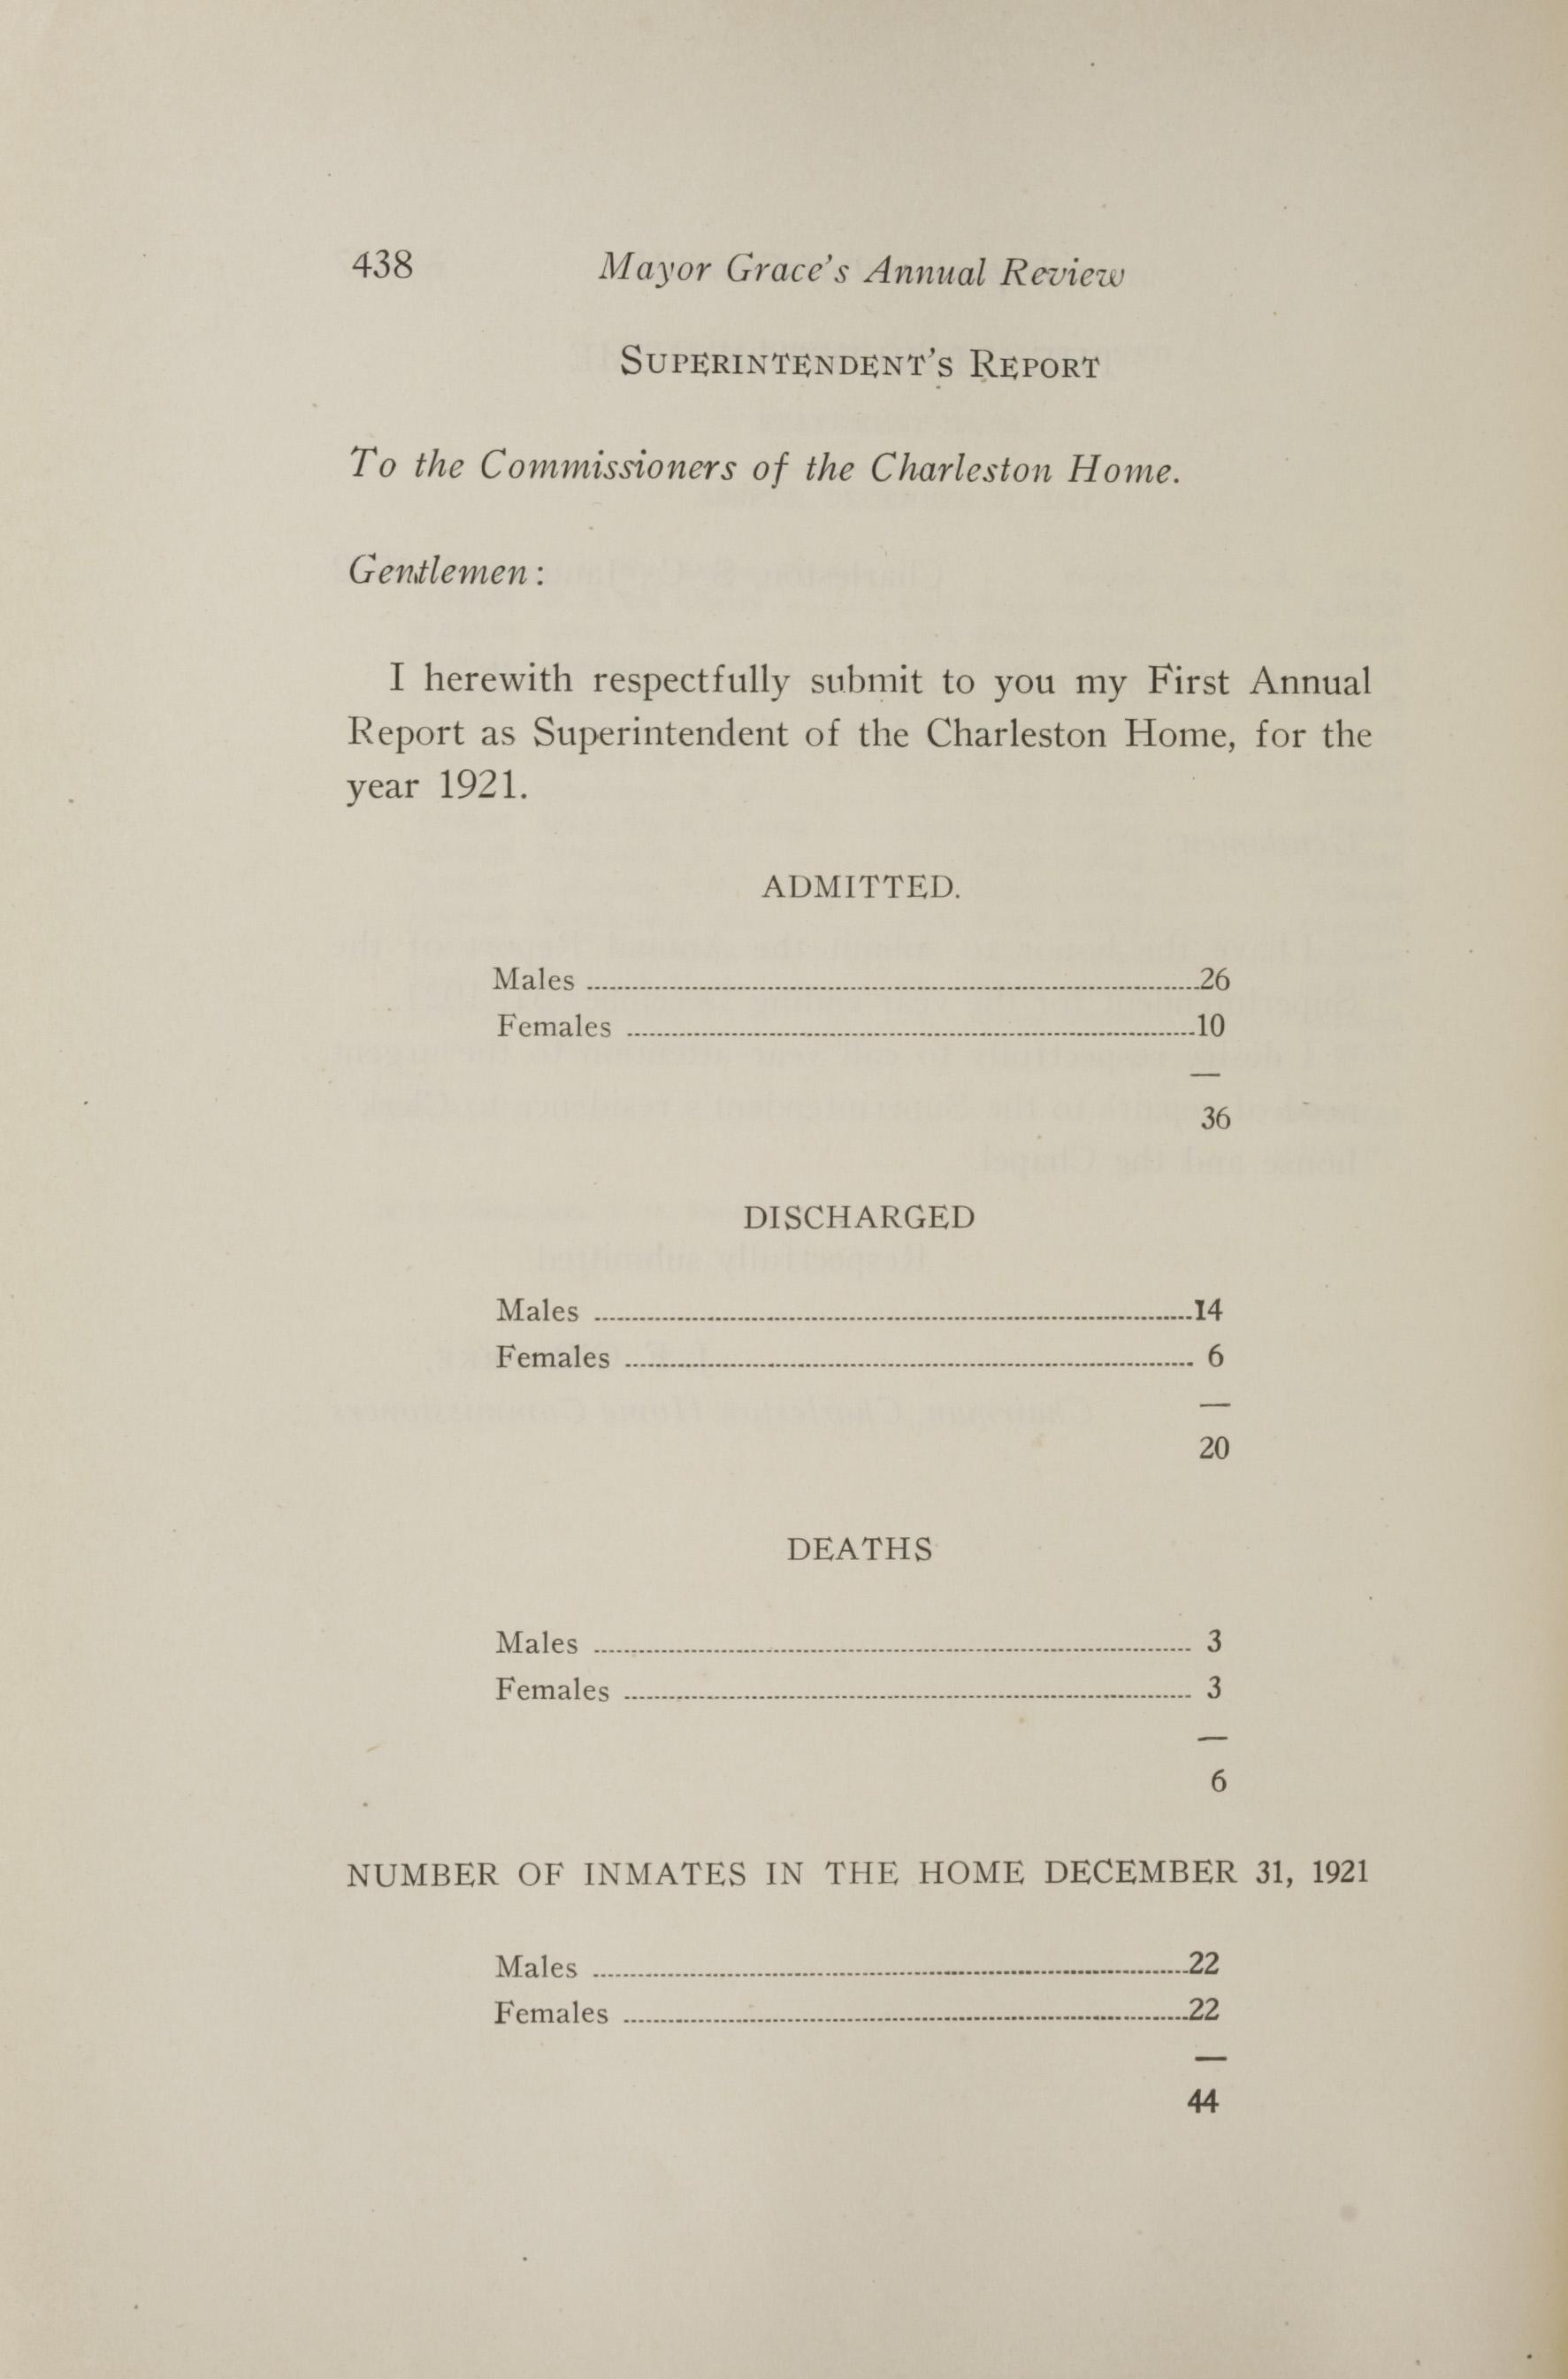 Charleston Yearbook, 1921, page 438